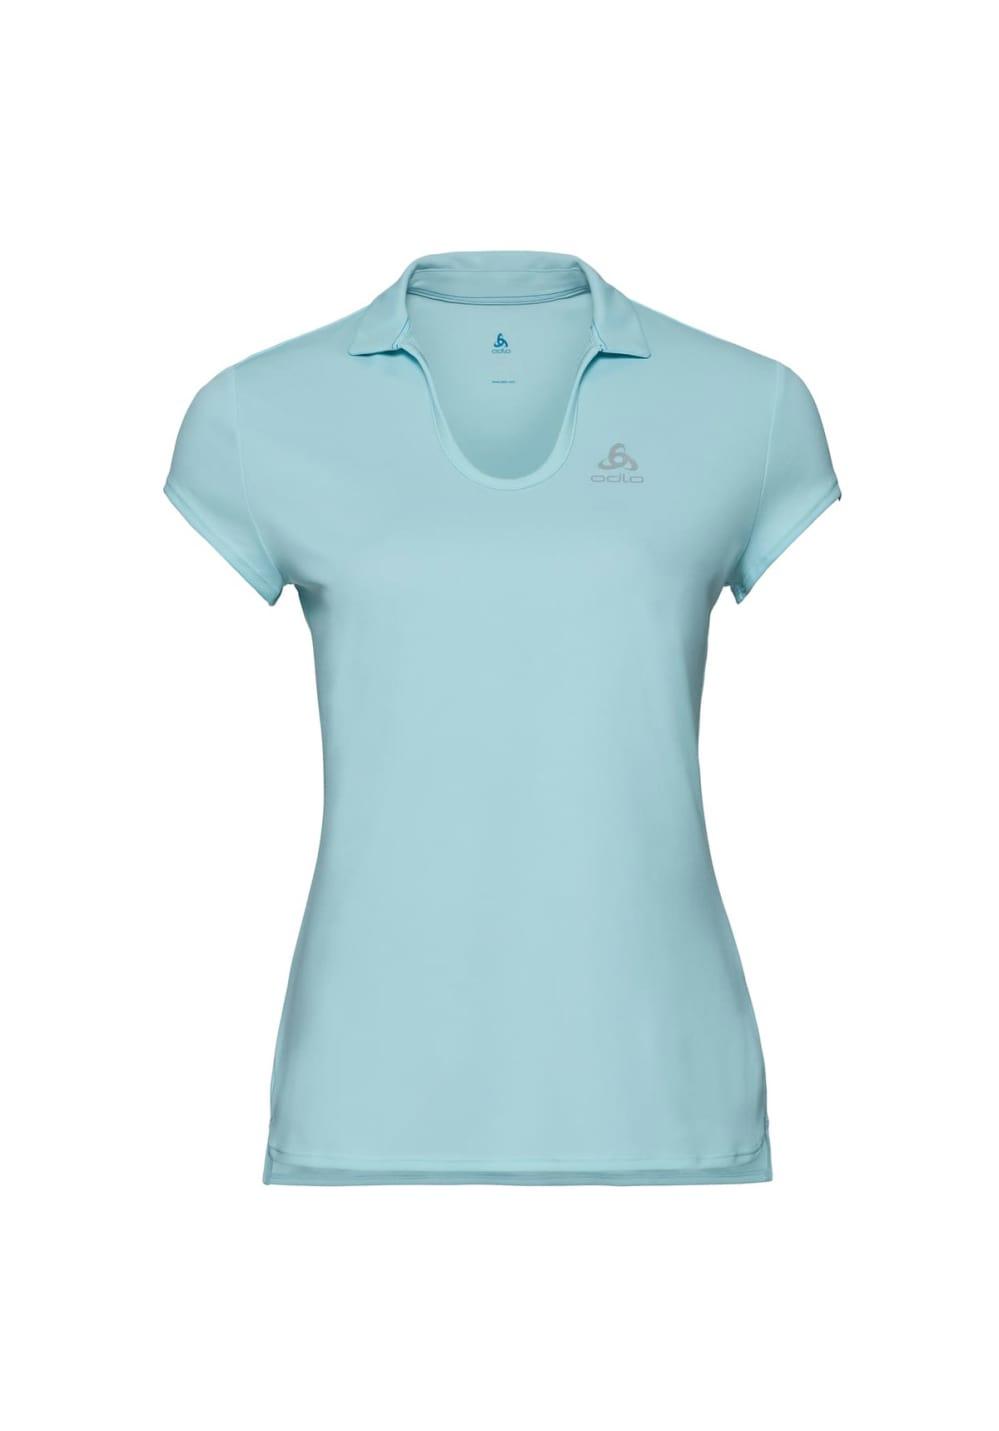 Sportmode für Frauen - Odlo Polo Short Sleeve Kumano Light Laufshirts für Damen Blau  - Onlineshop 21Run